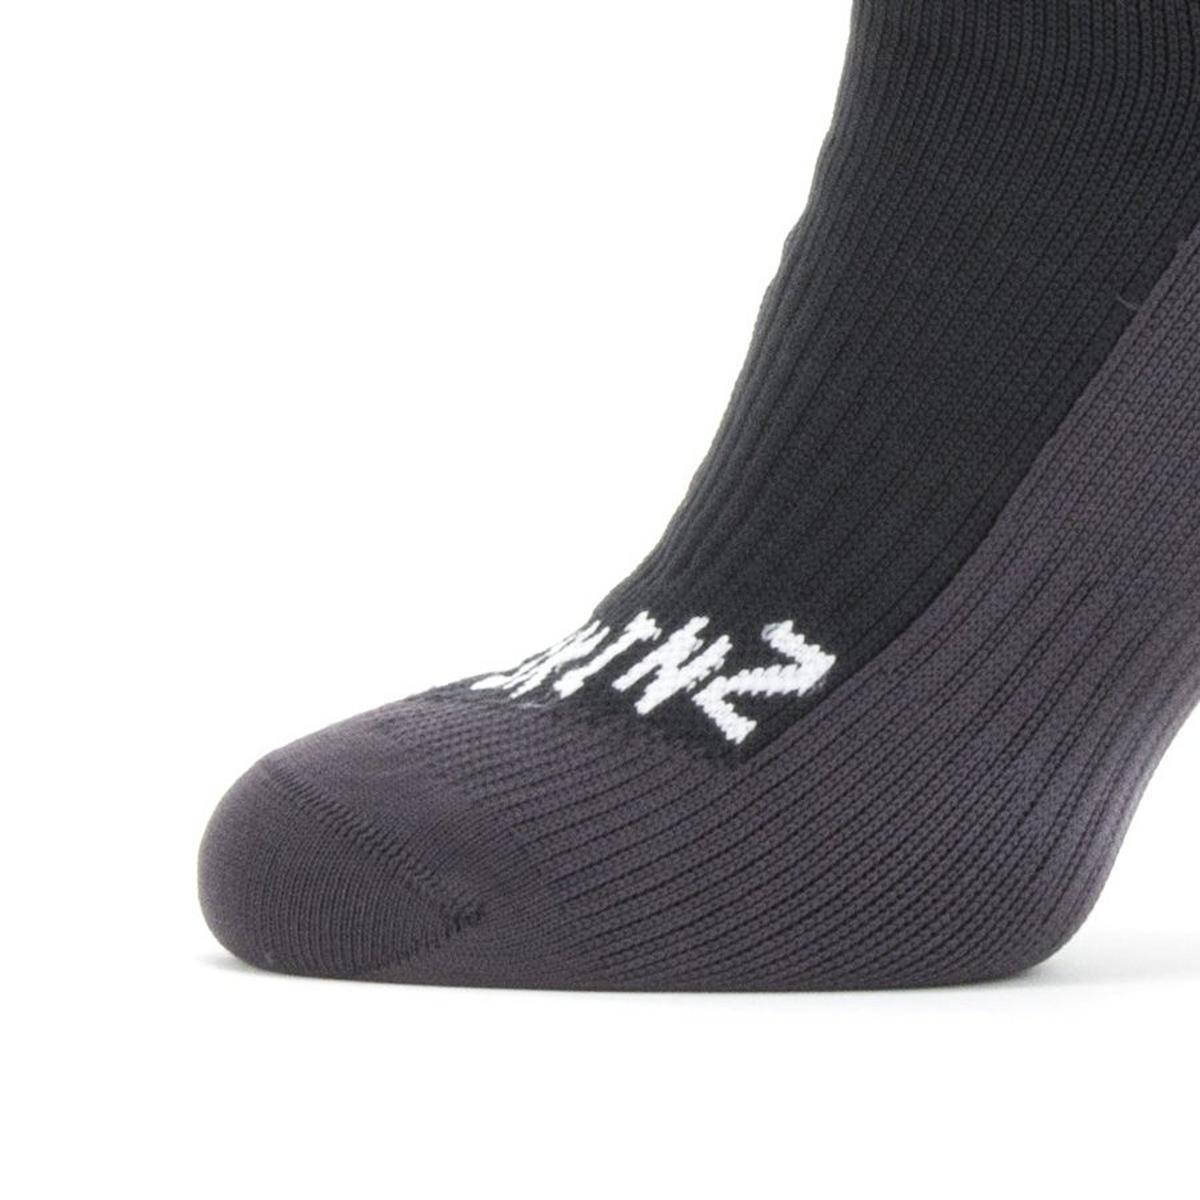 Sealskinz Unisex Sealskinz Waterproof Cold Weather Mid Sock - Black